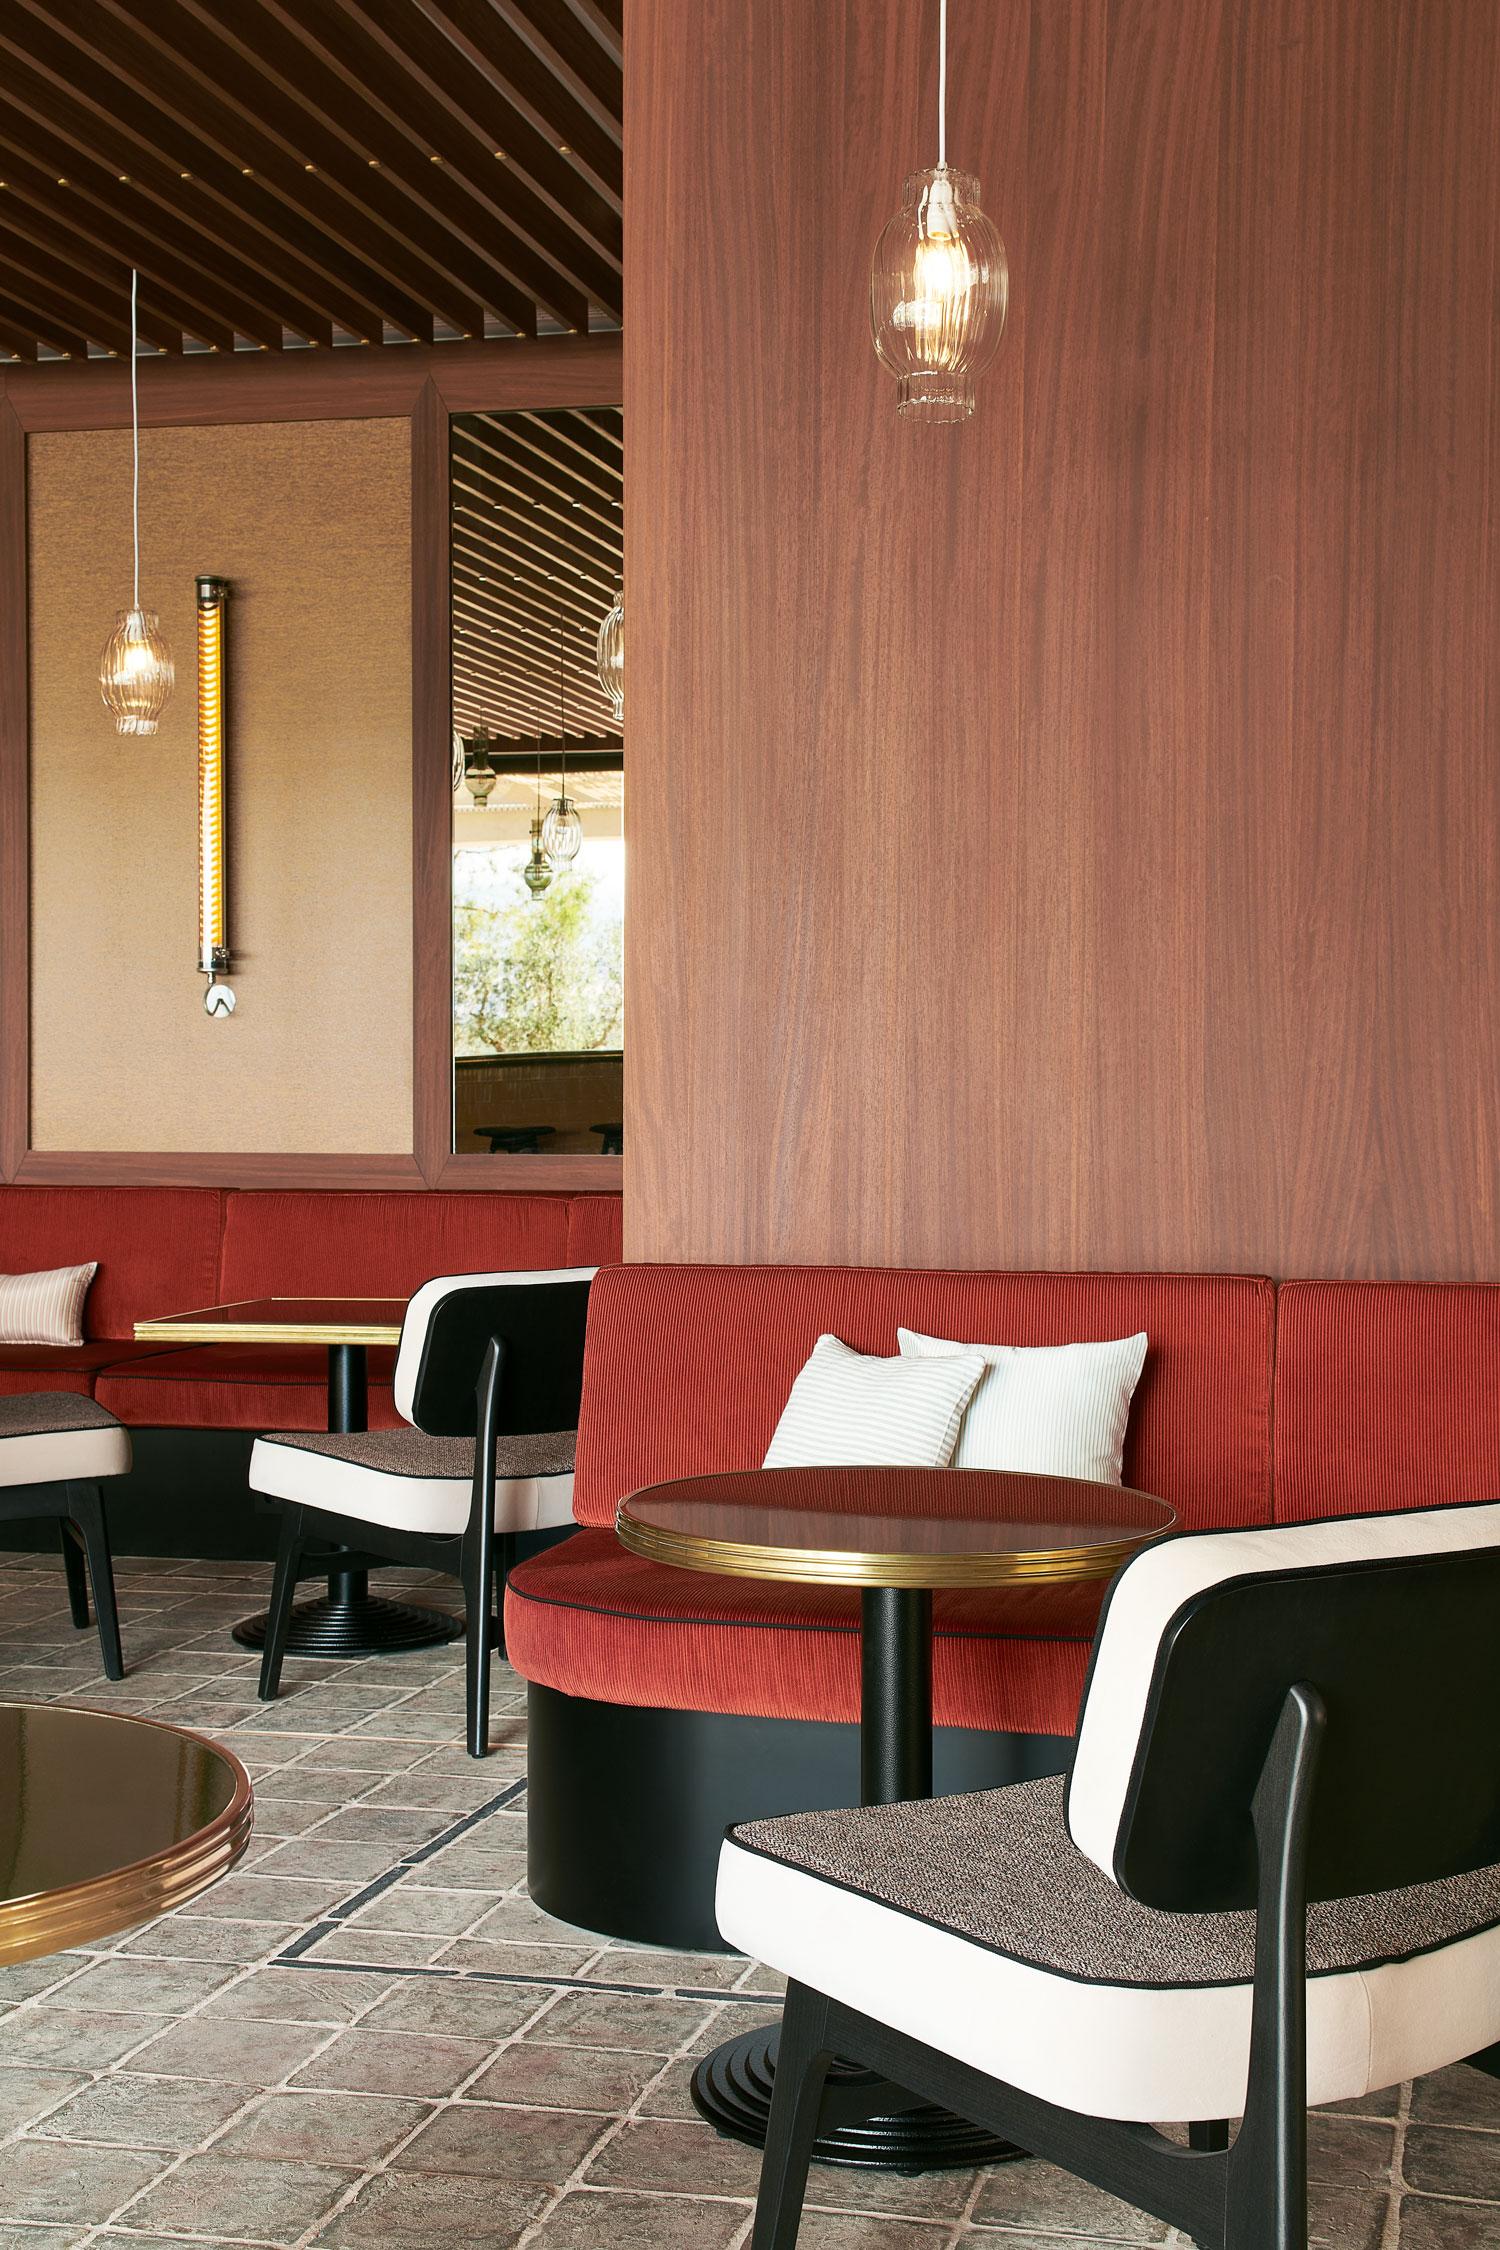 Lam Studio Hotel Maslina Hvar Croatia Luxury Accommodatino Photo Claire Israel Yellowtrace 22